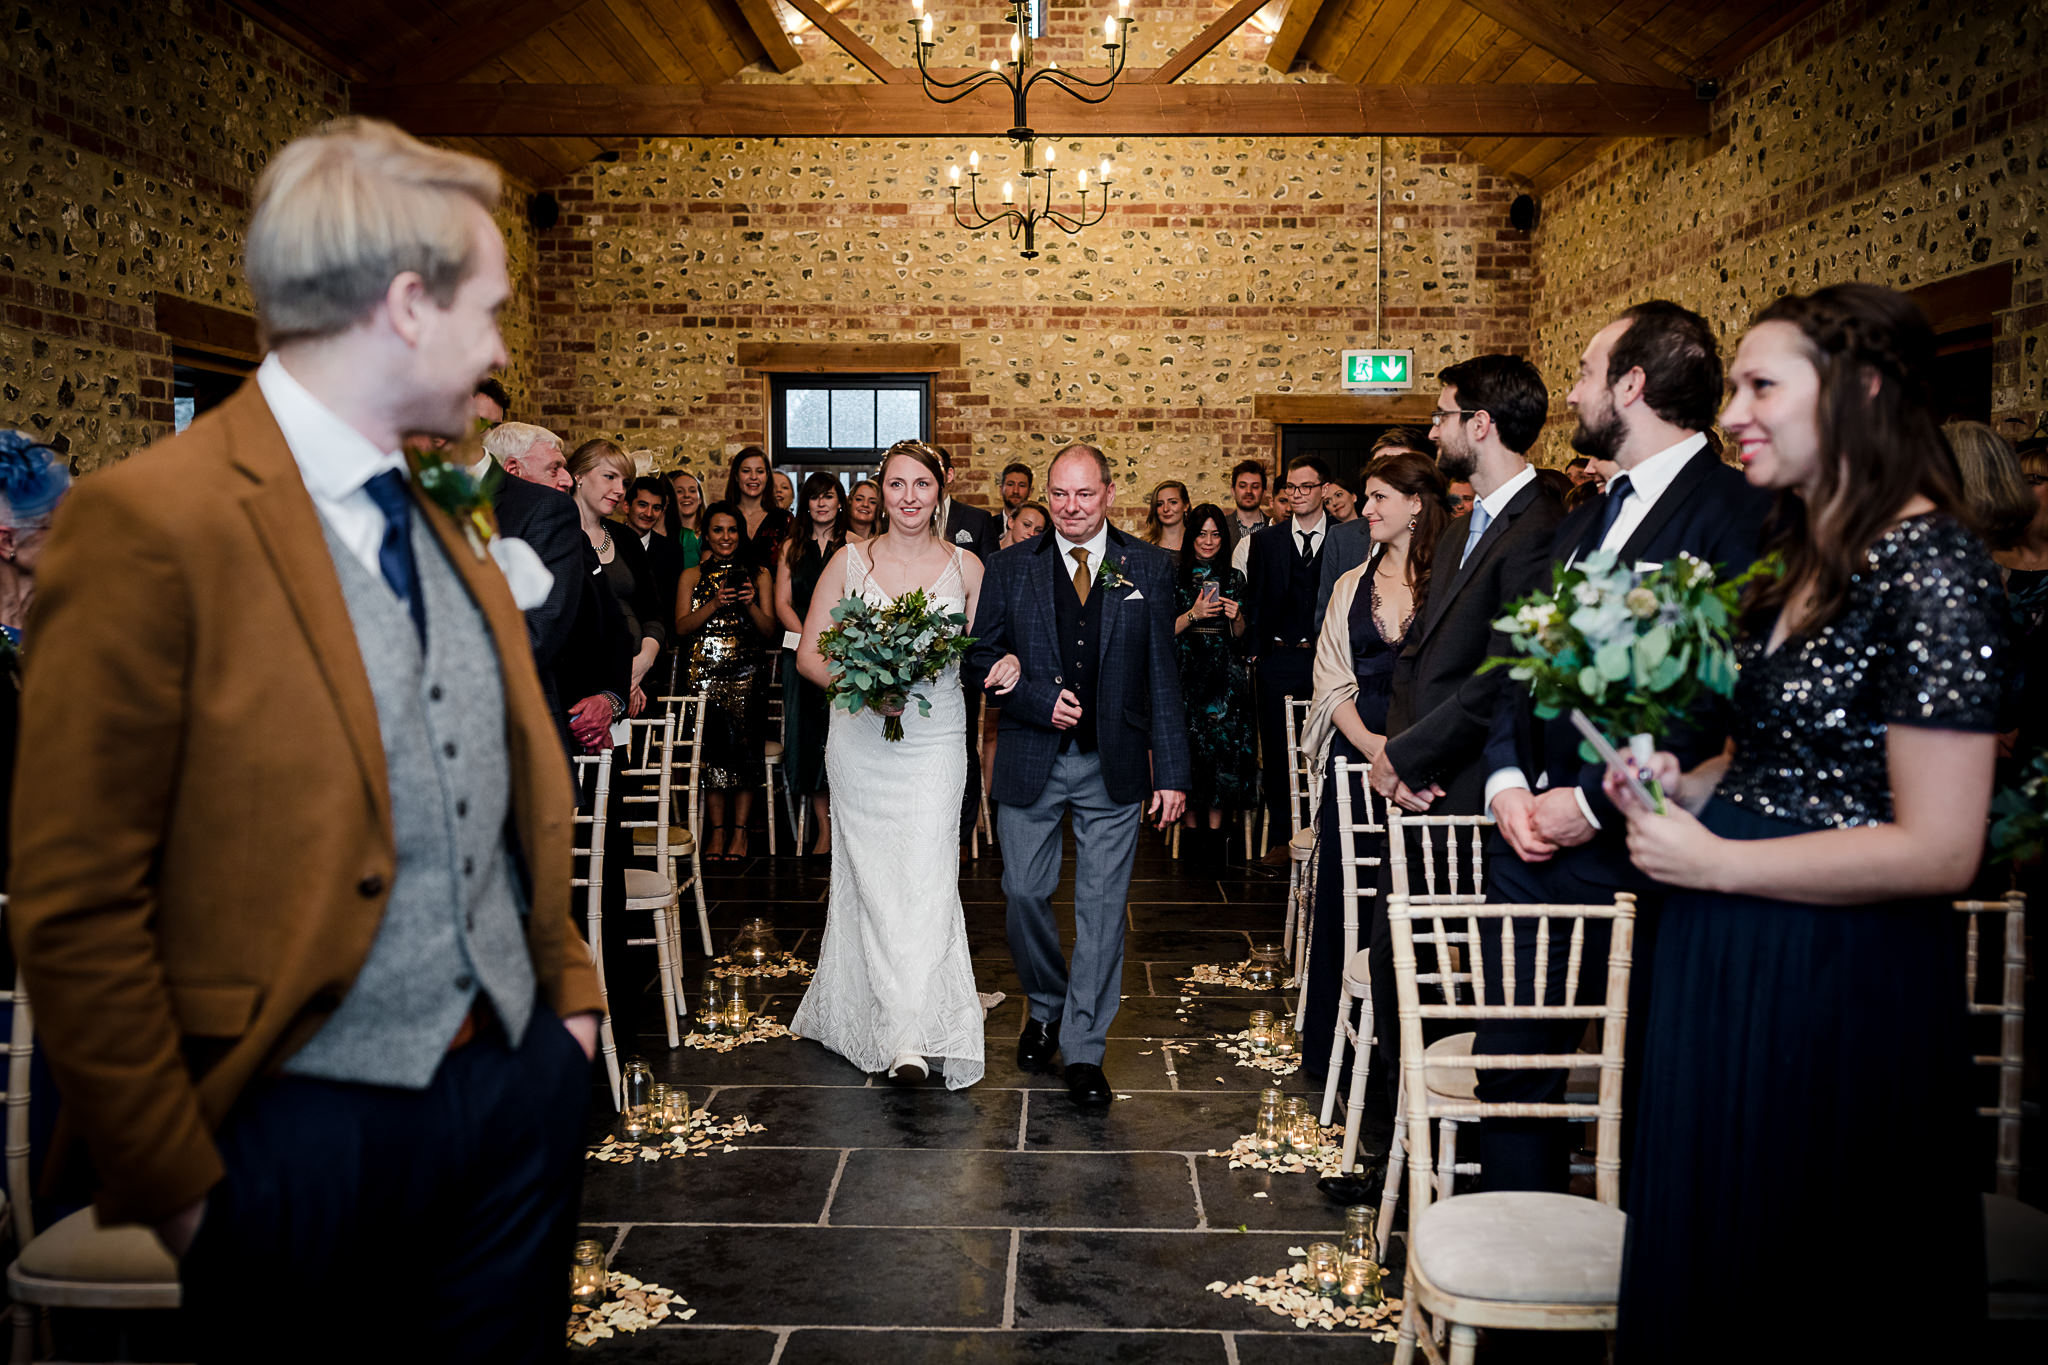 The Gathering Barn Wedding - Art by Design Photography - wedding ceremony